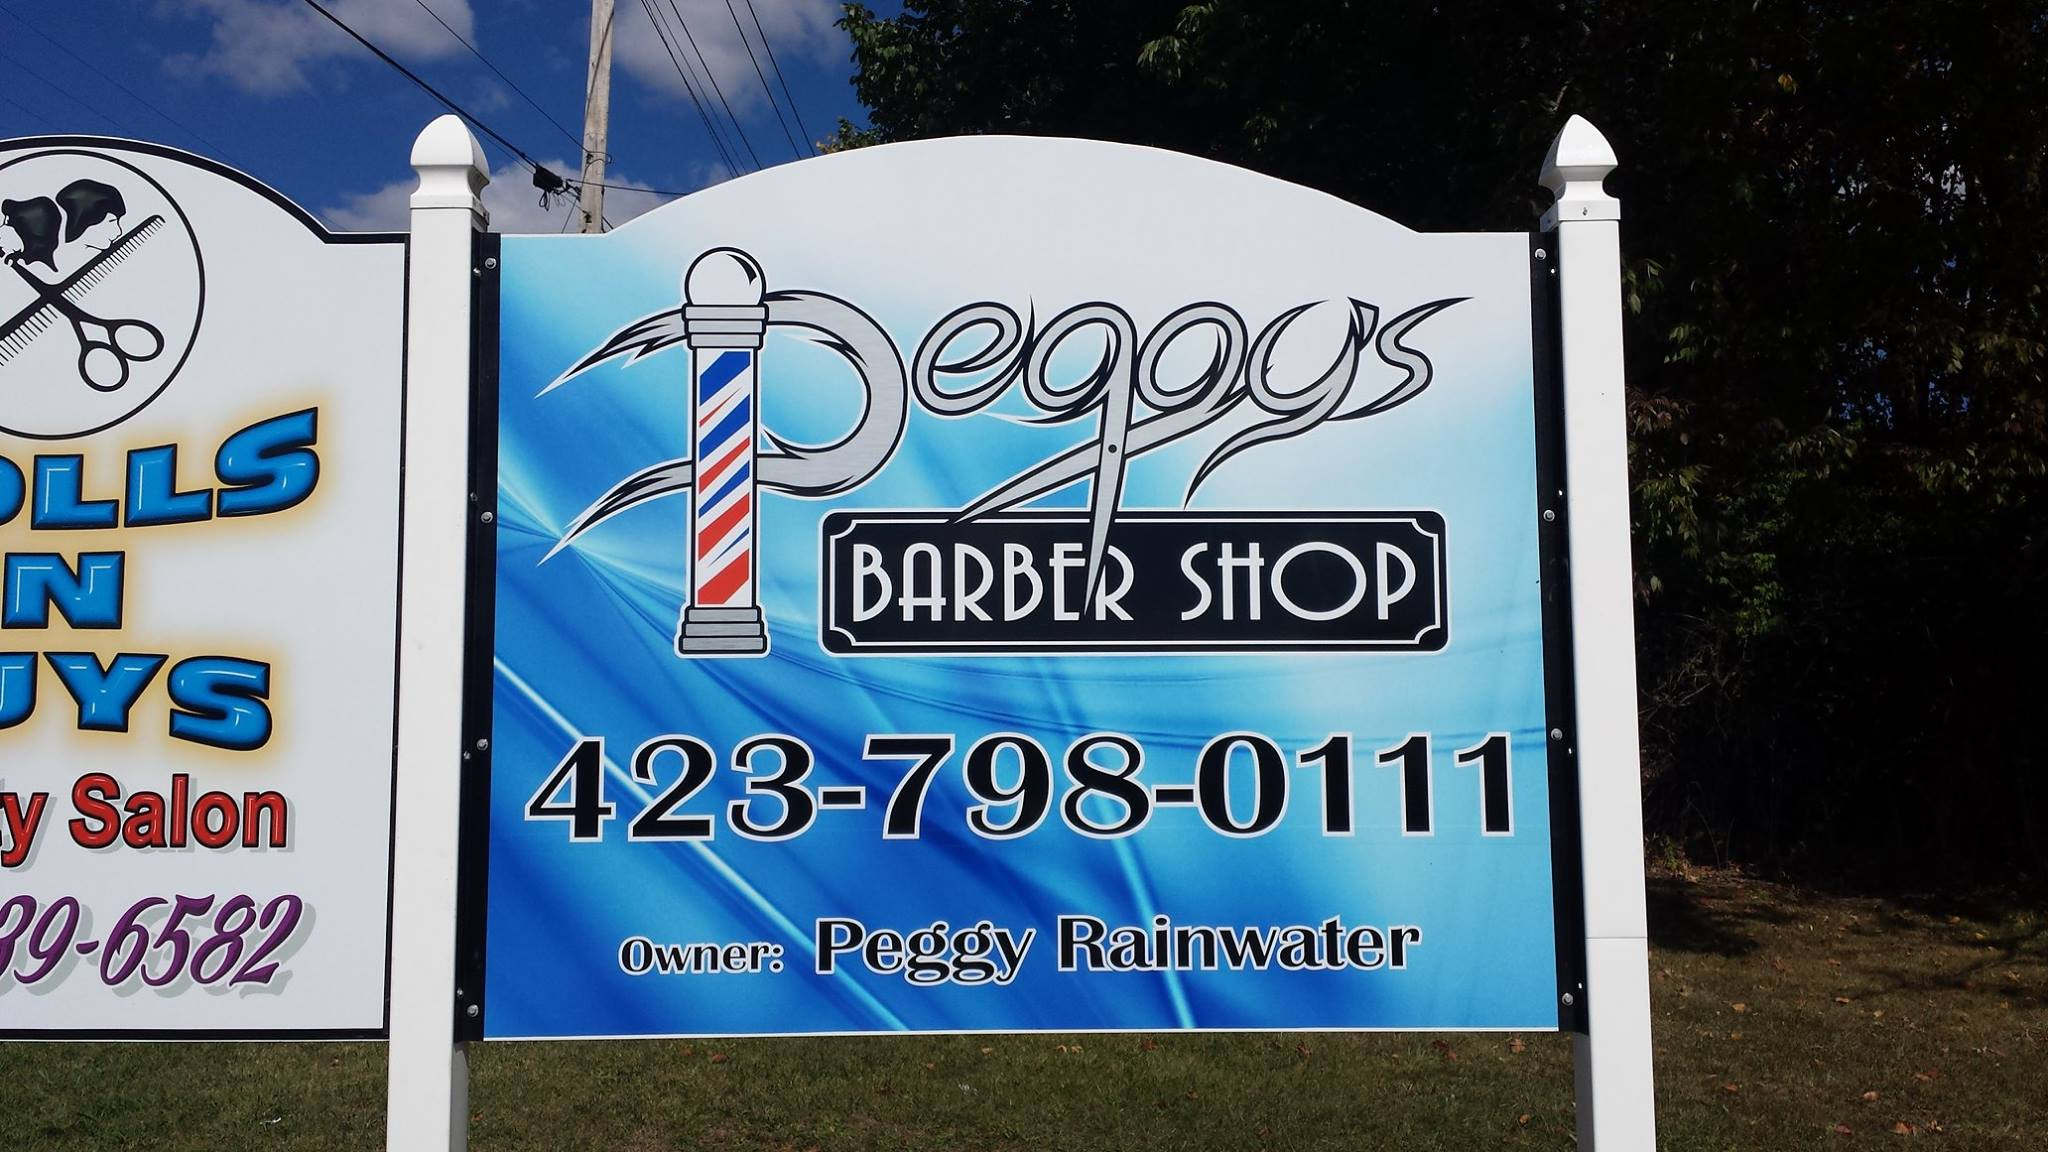 Peggy's Barber Shop